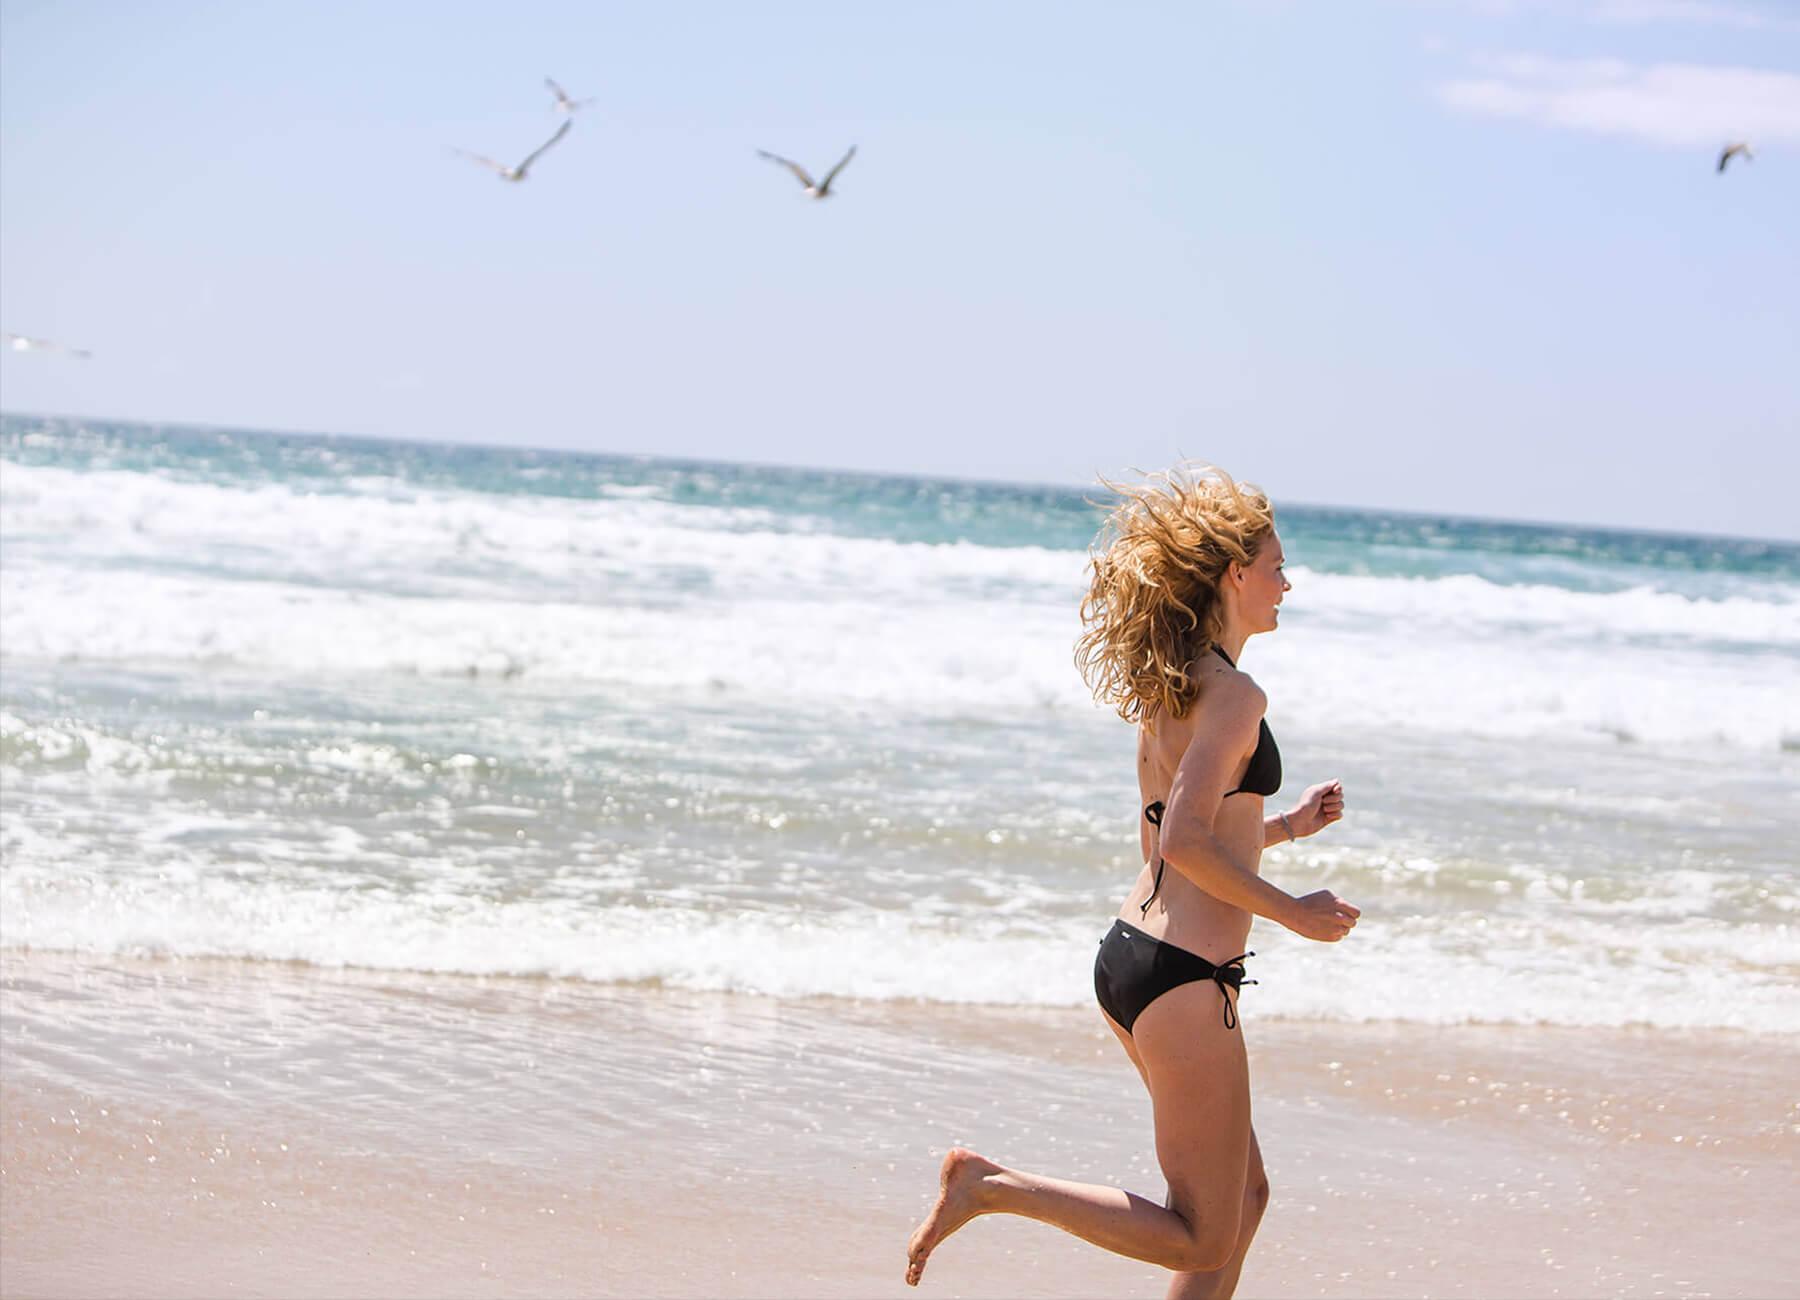 Lisboa_Beach_Running_Seagal